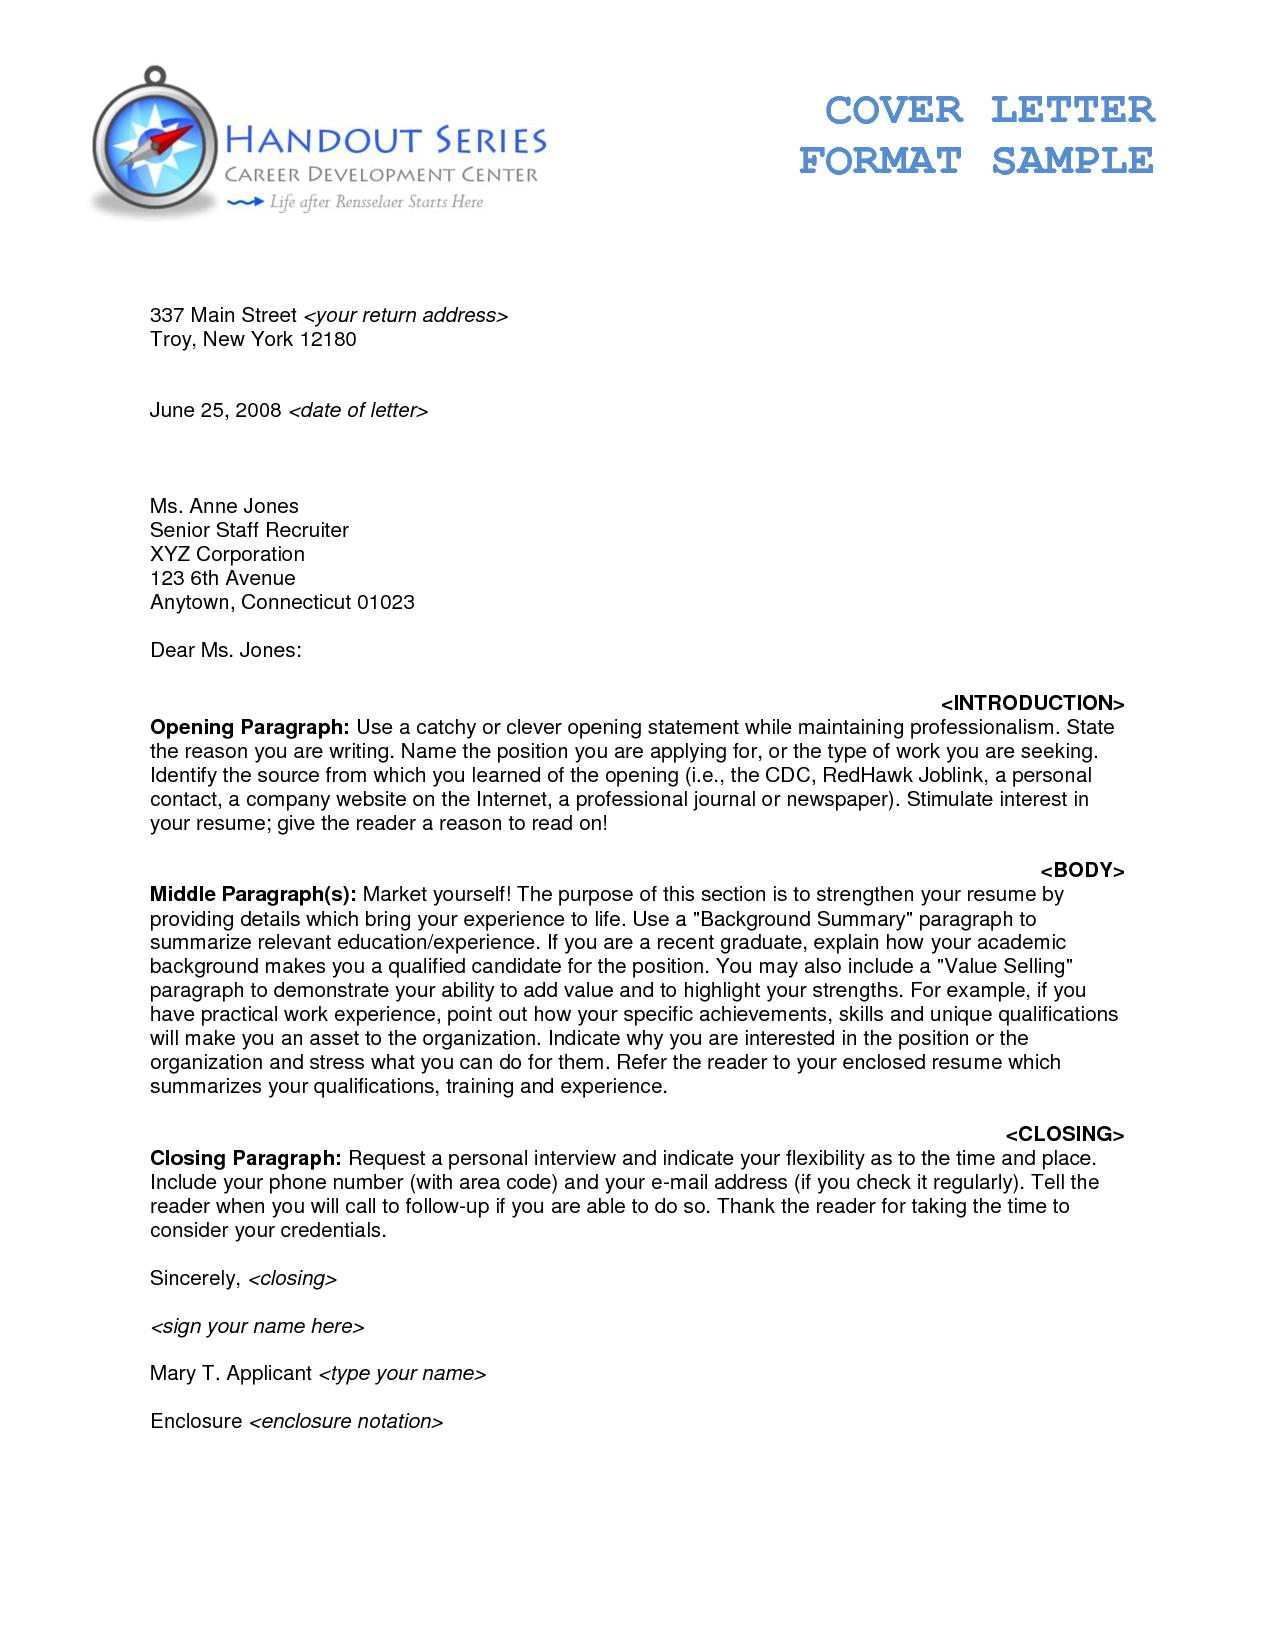 Best Photos Legal Letter Format Sample Requesting Credit Business With  Enclosures Dialysis Nurse  Dialysis Nurse Resume